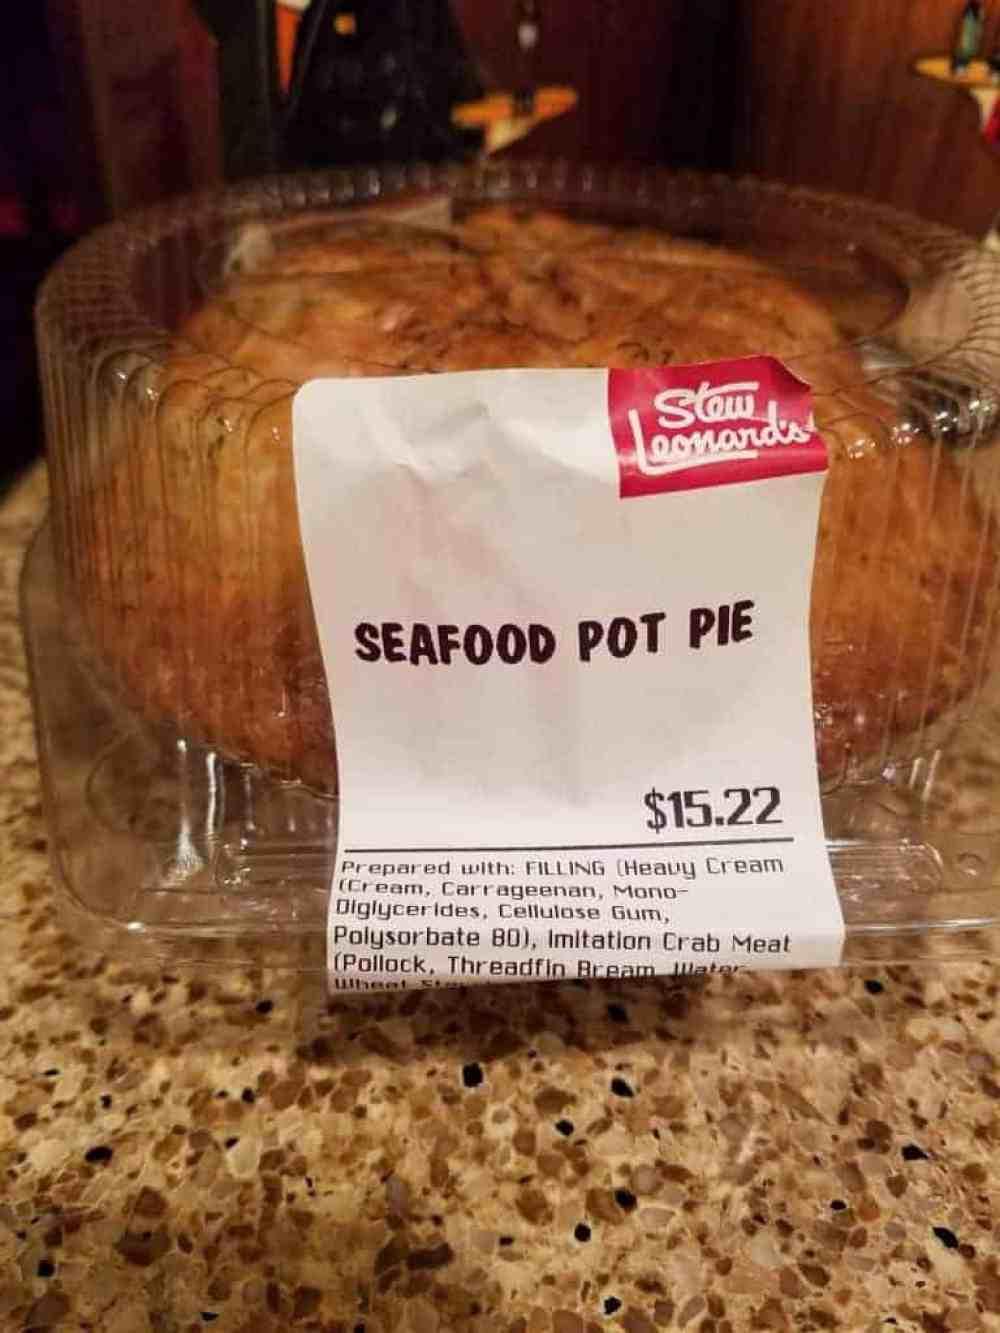 Stew Leonard's Seafood Pot Pie